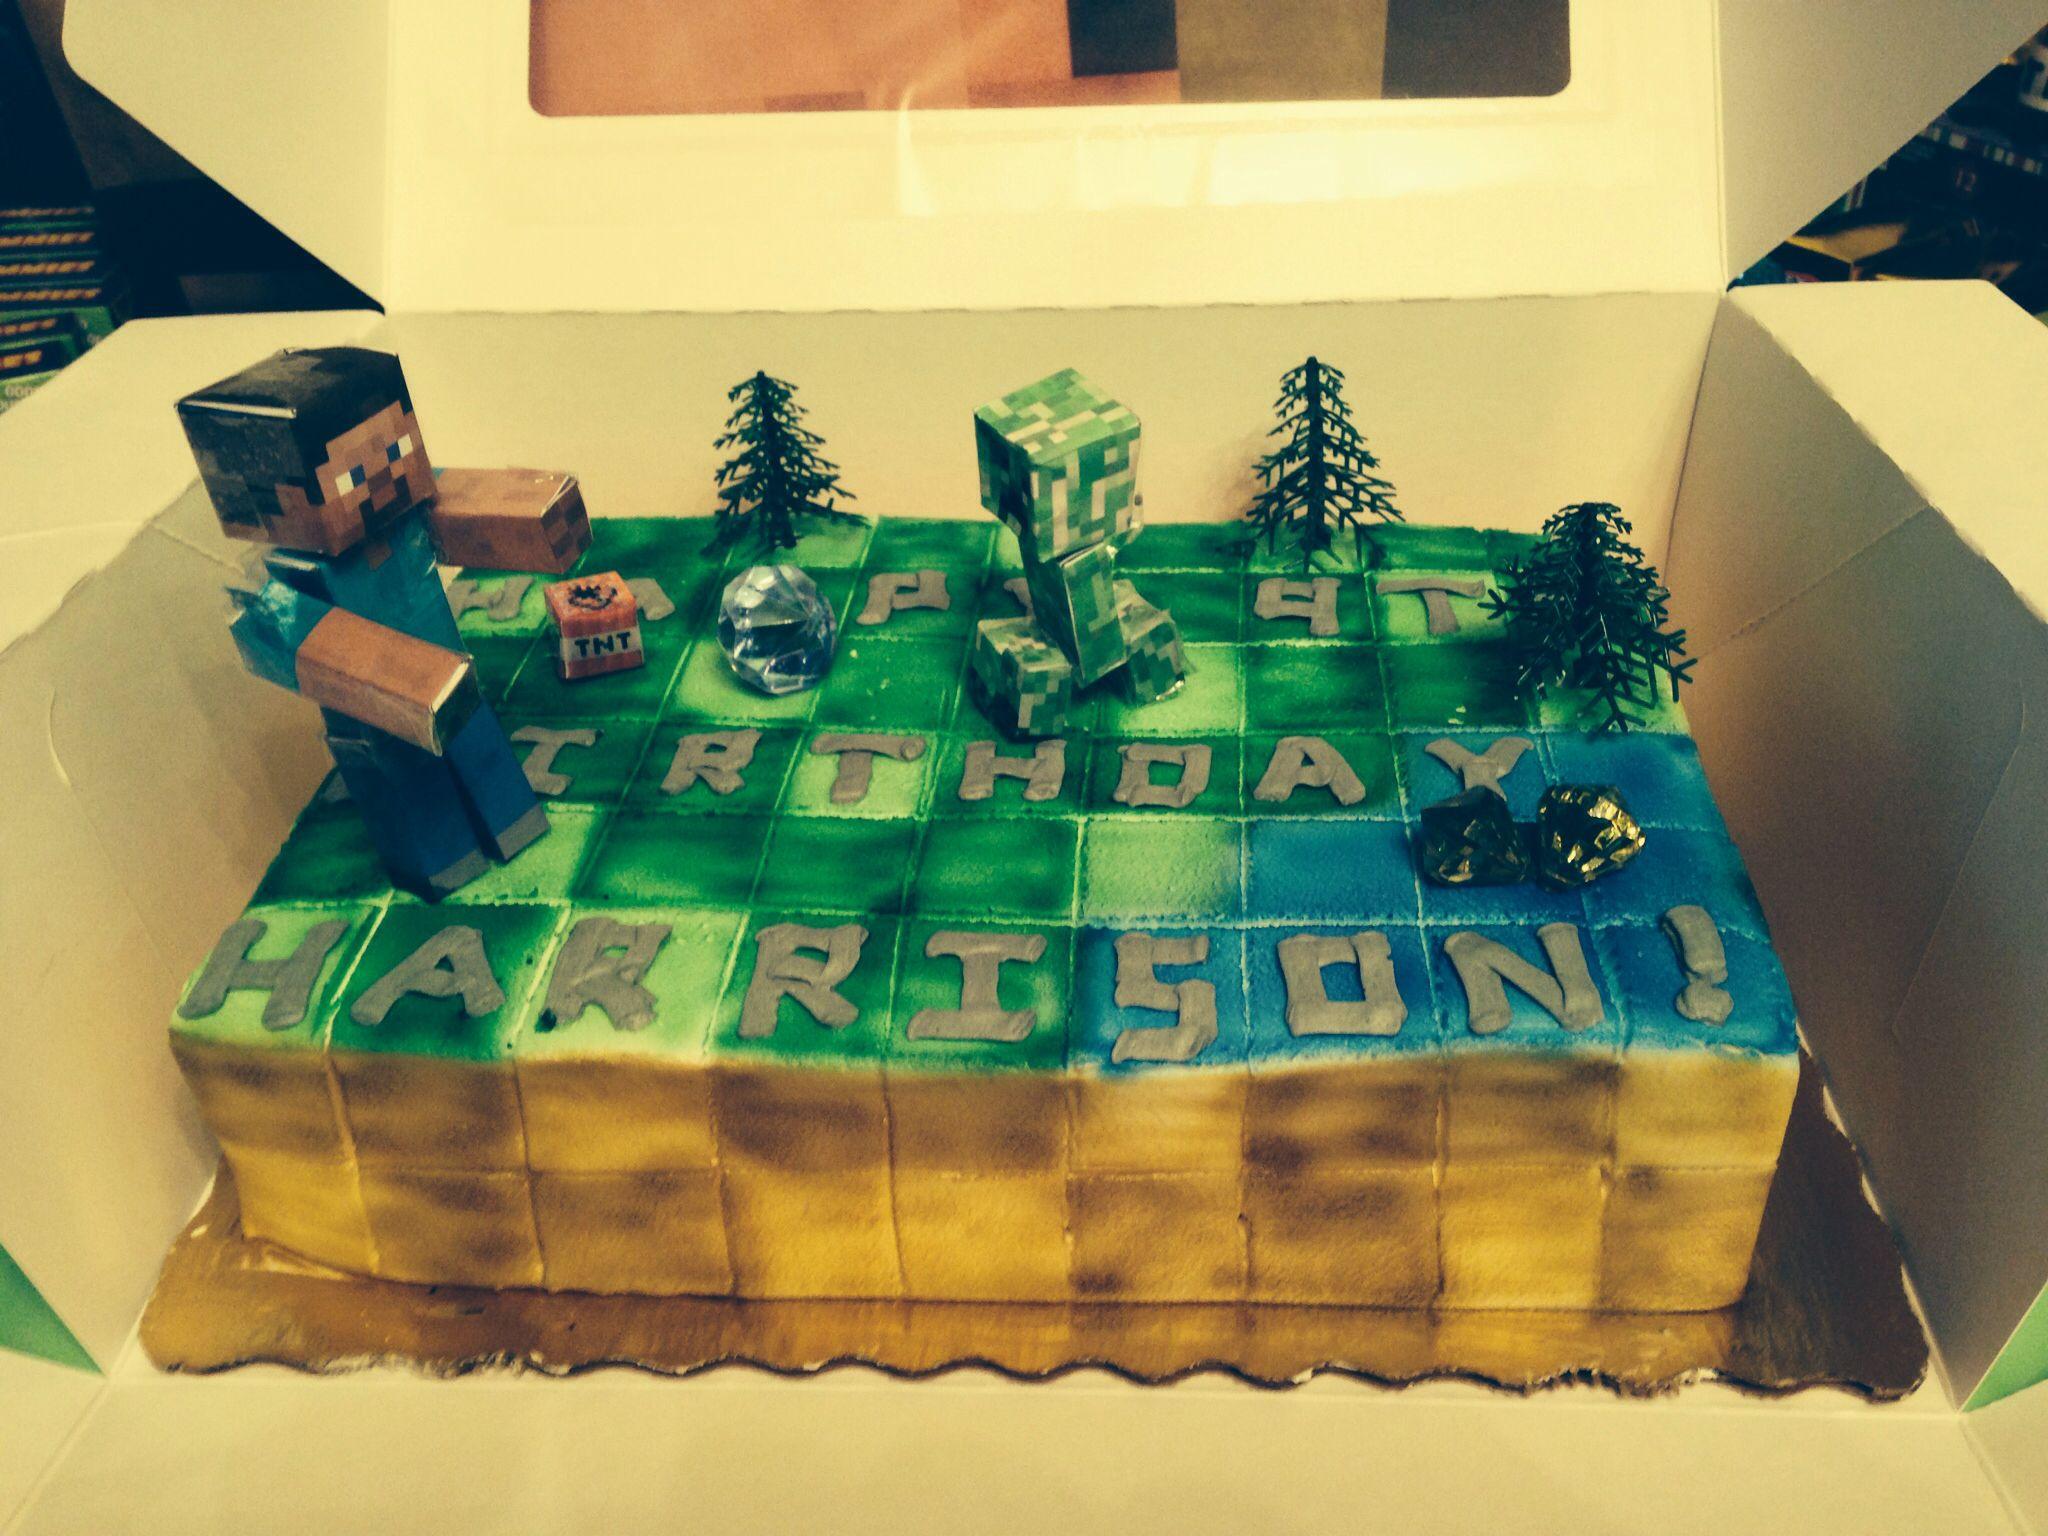 Publix Cake Designs For Birthdays : Minecraft publix s cake Party ideas Pinterest Cake ...